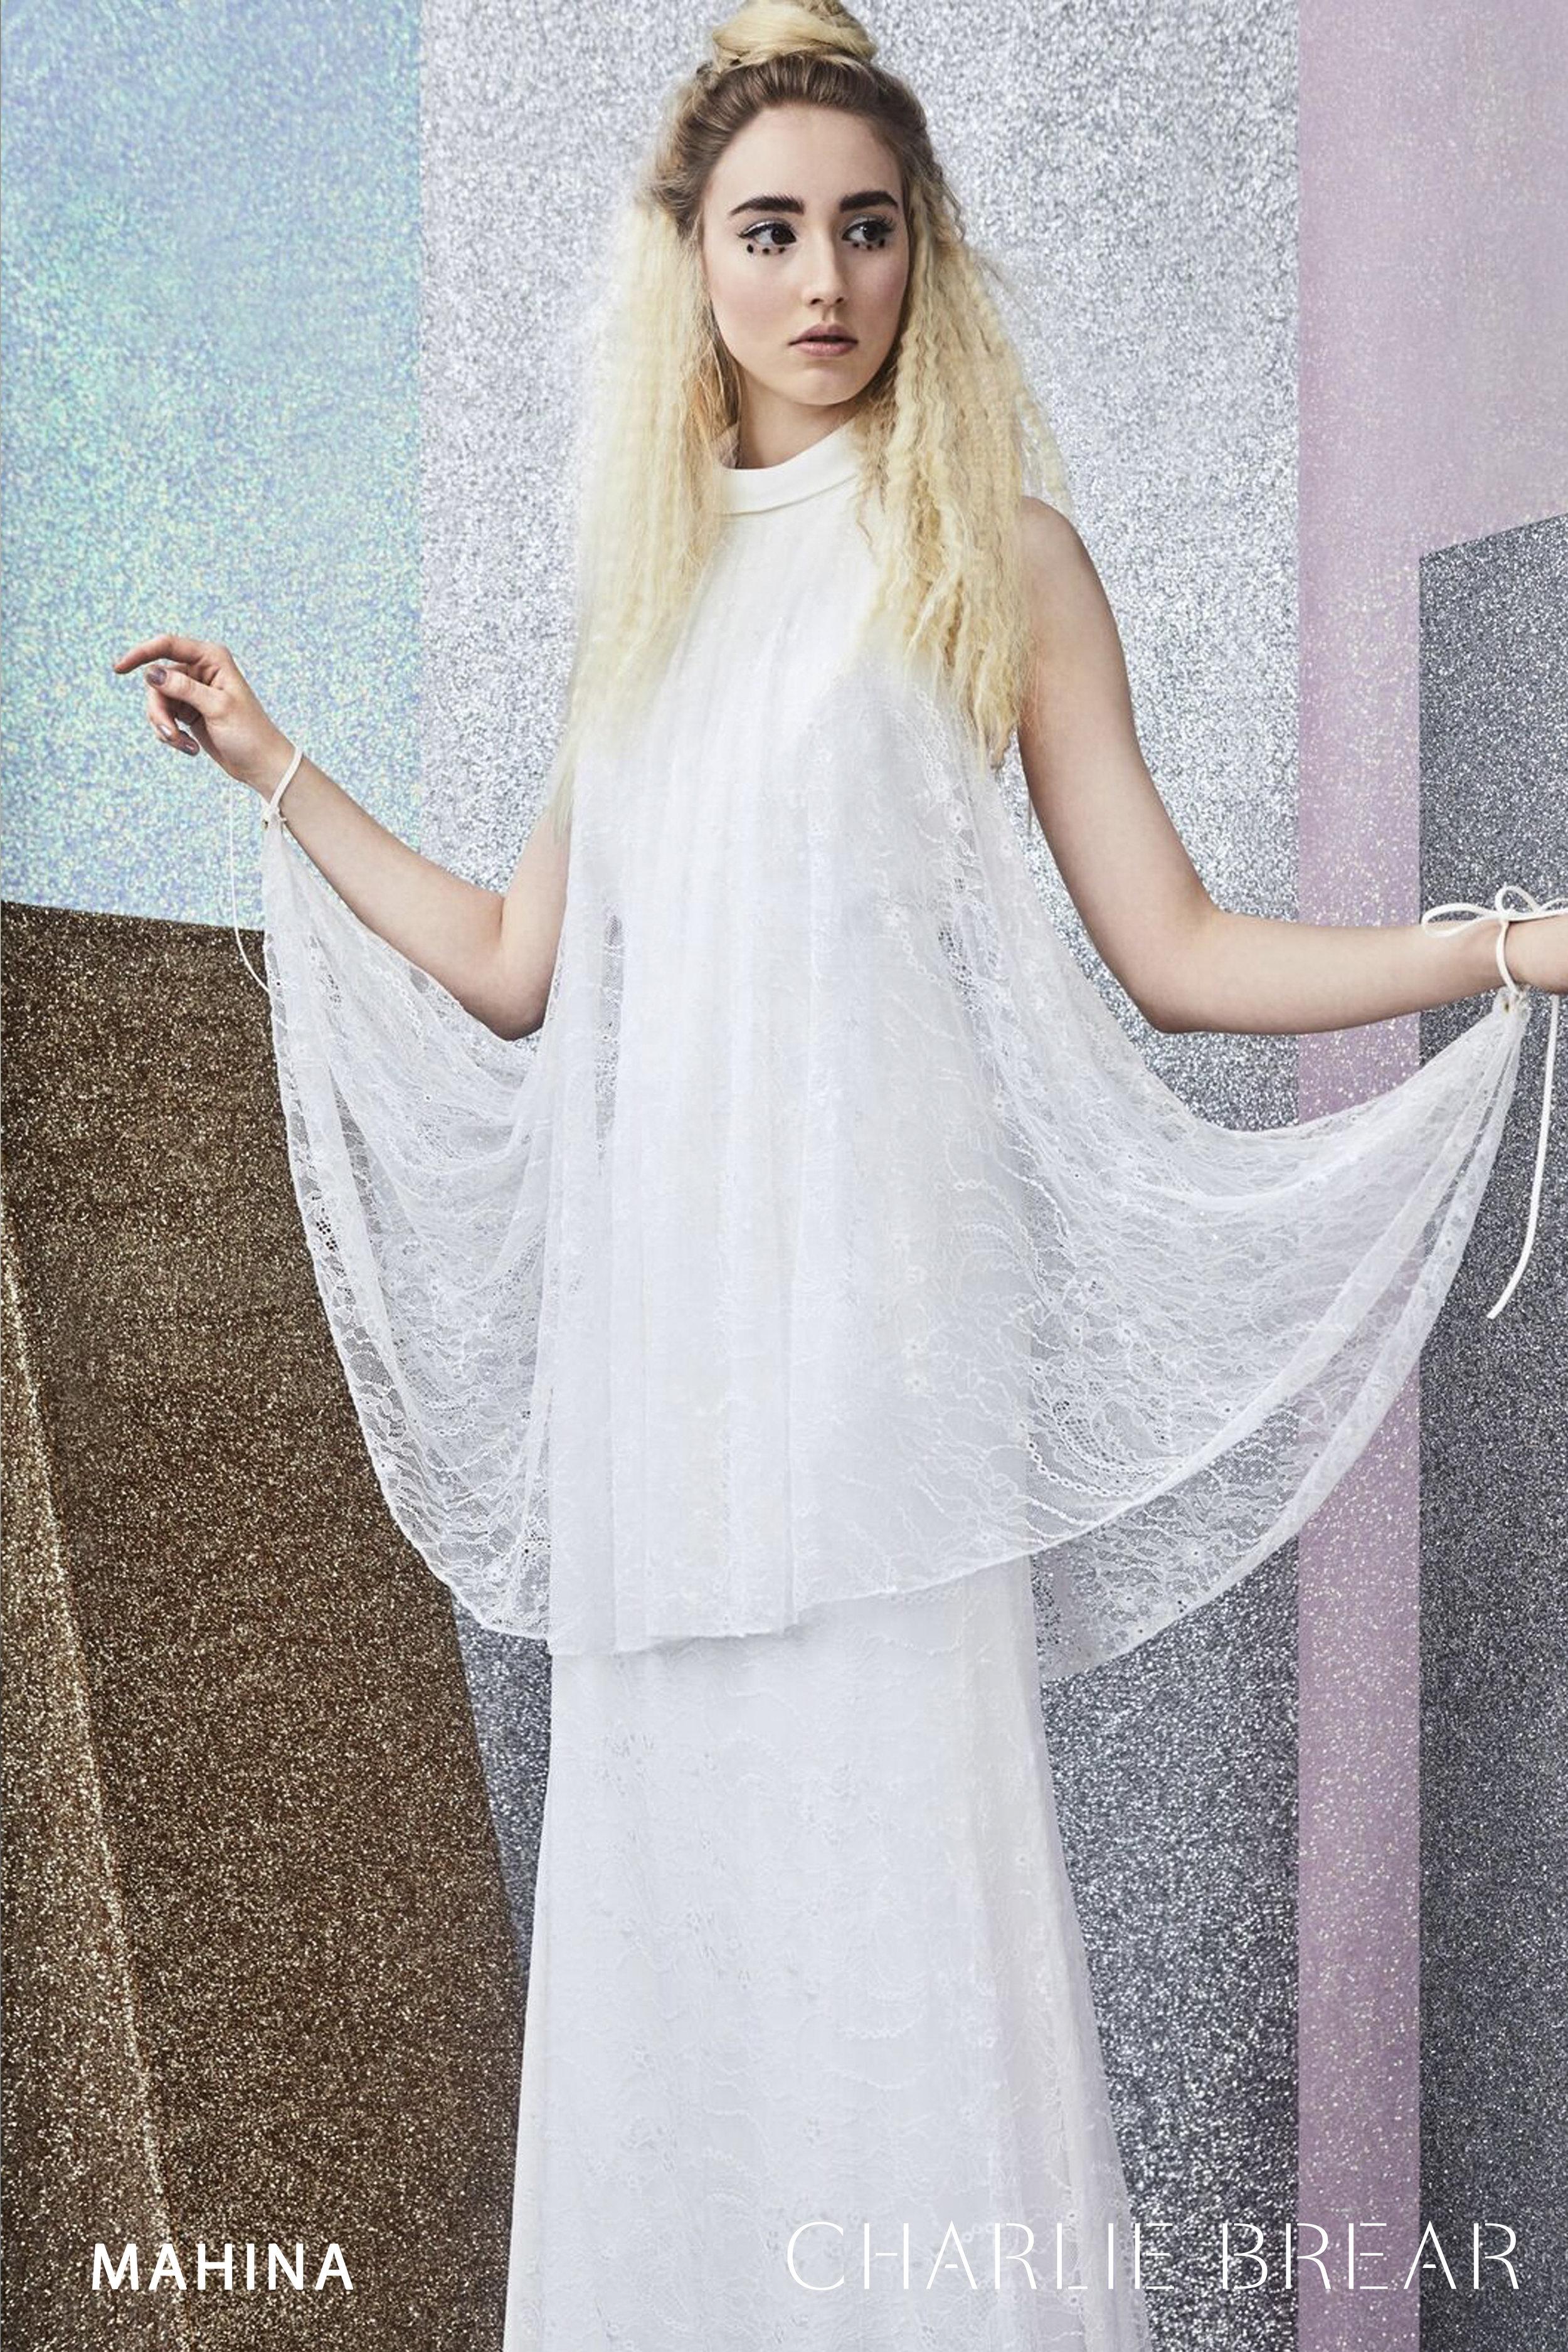 2018-charlie-brear-wedding-dress-mahina.jpg